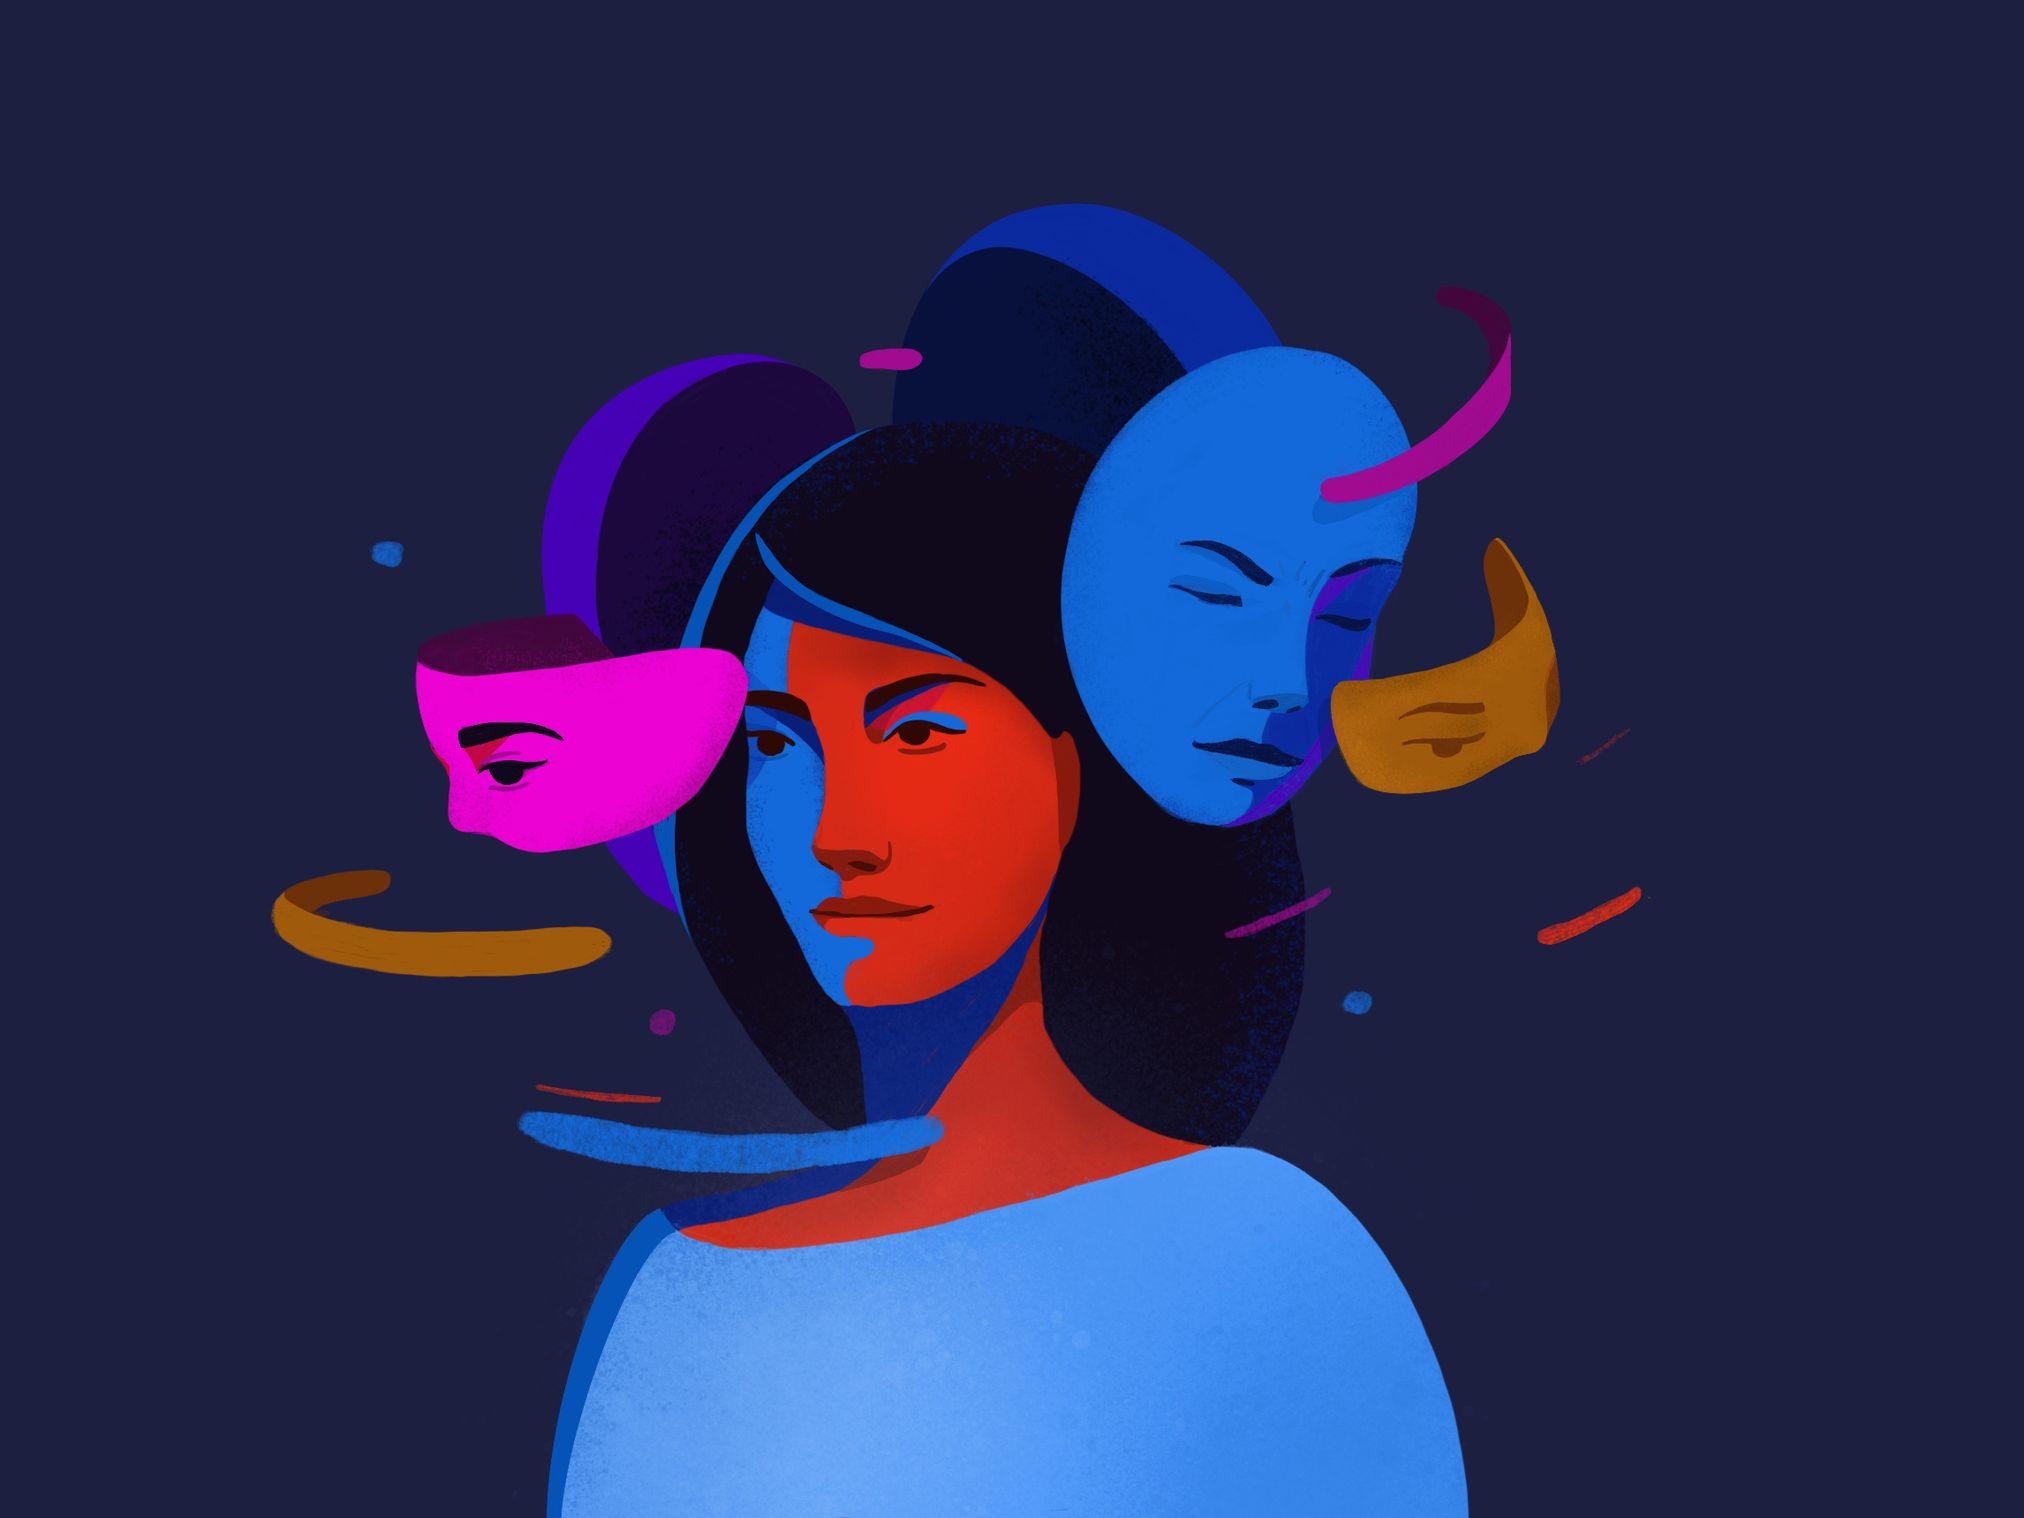 garance-illustration-Irina-Kruglova-The-masks-we-wear